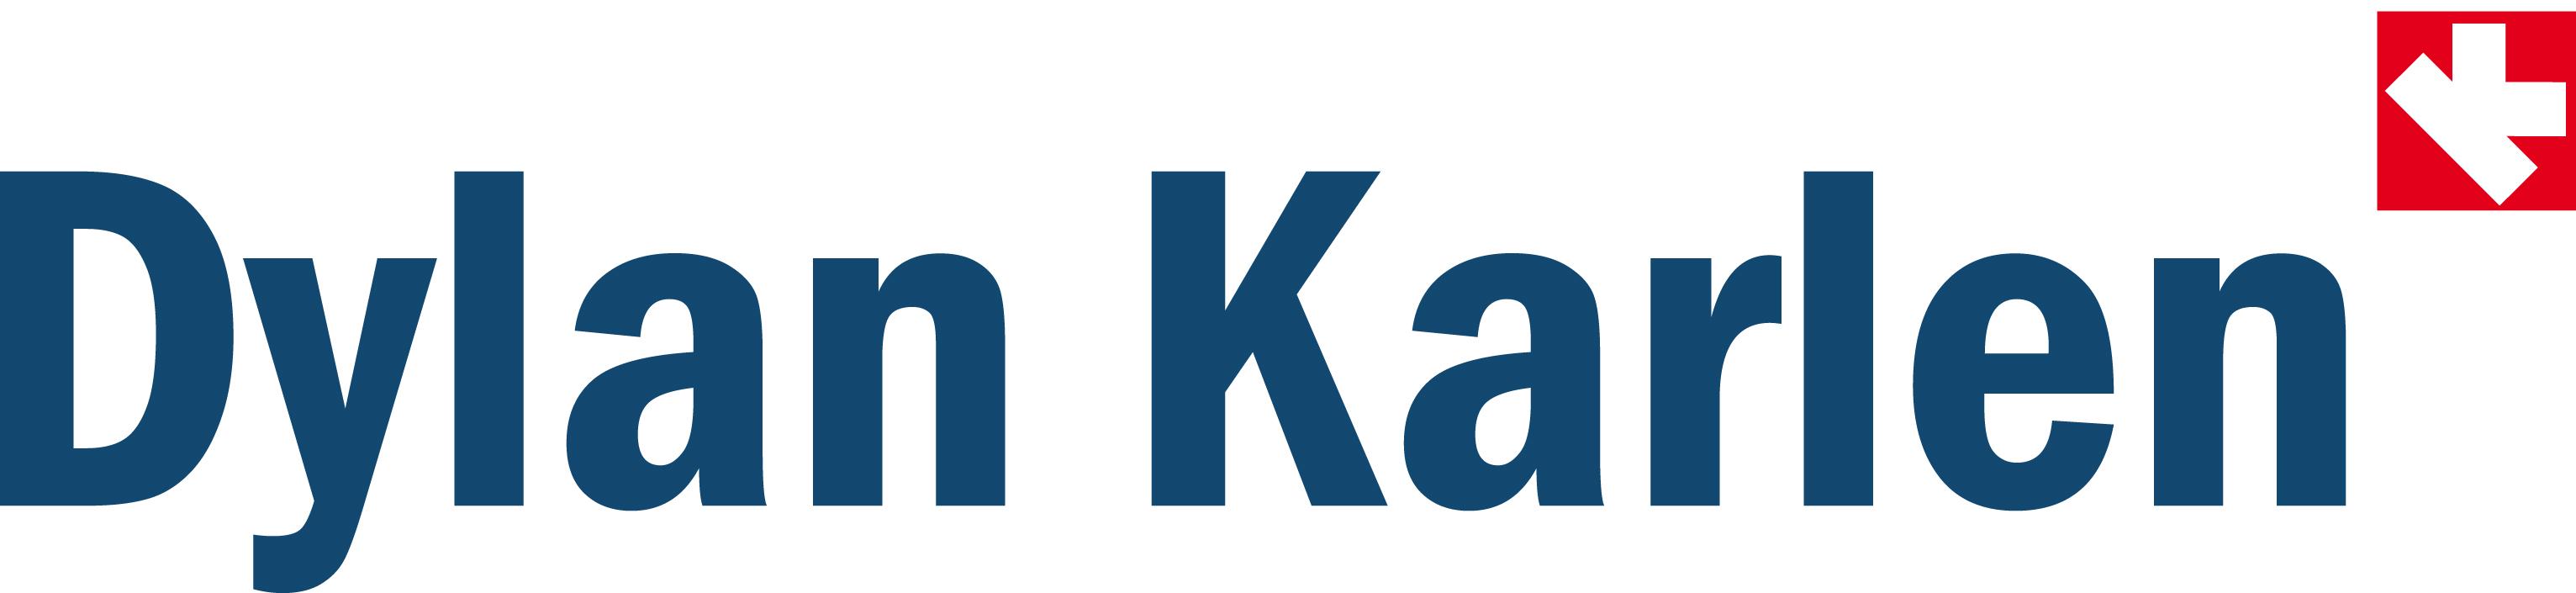 Dylan Karlen